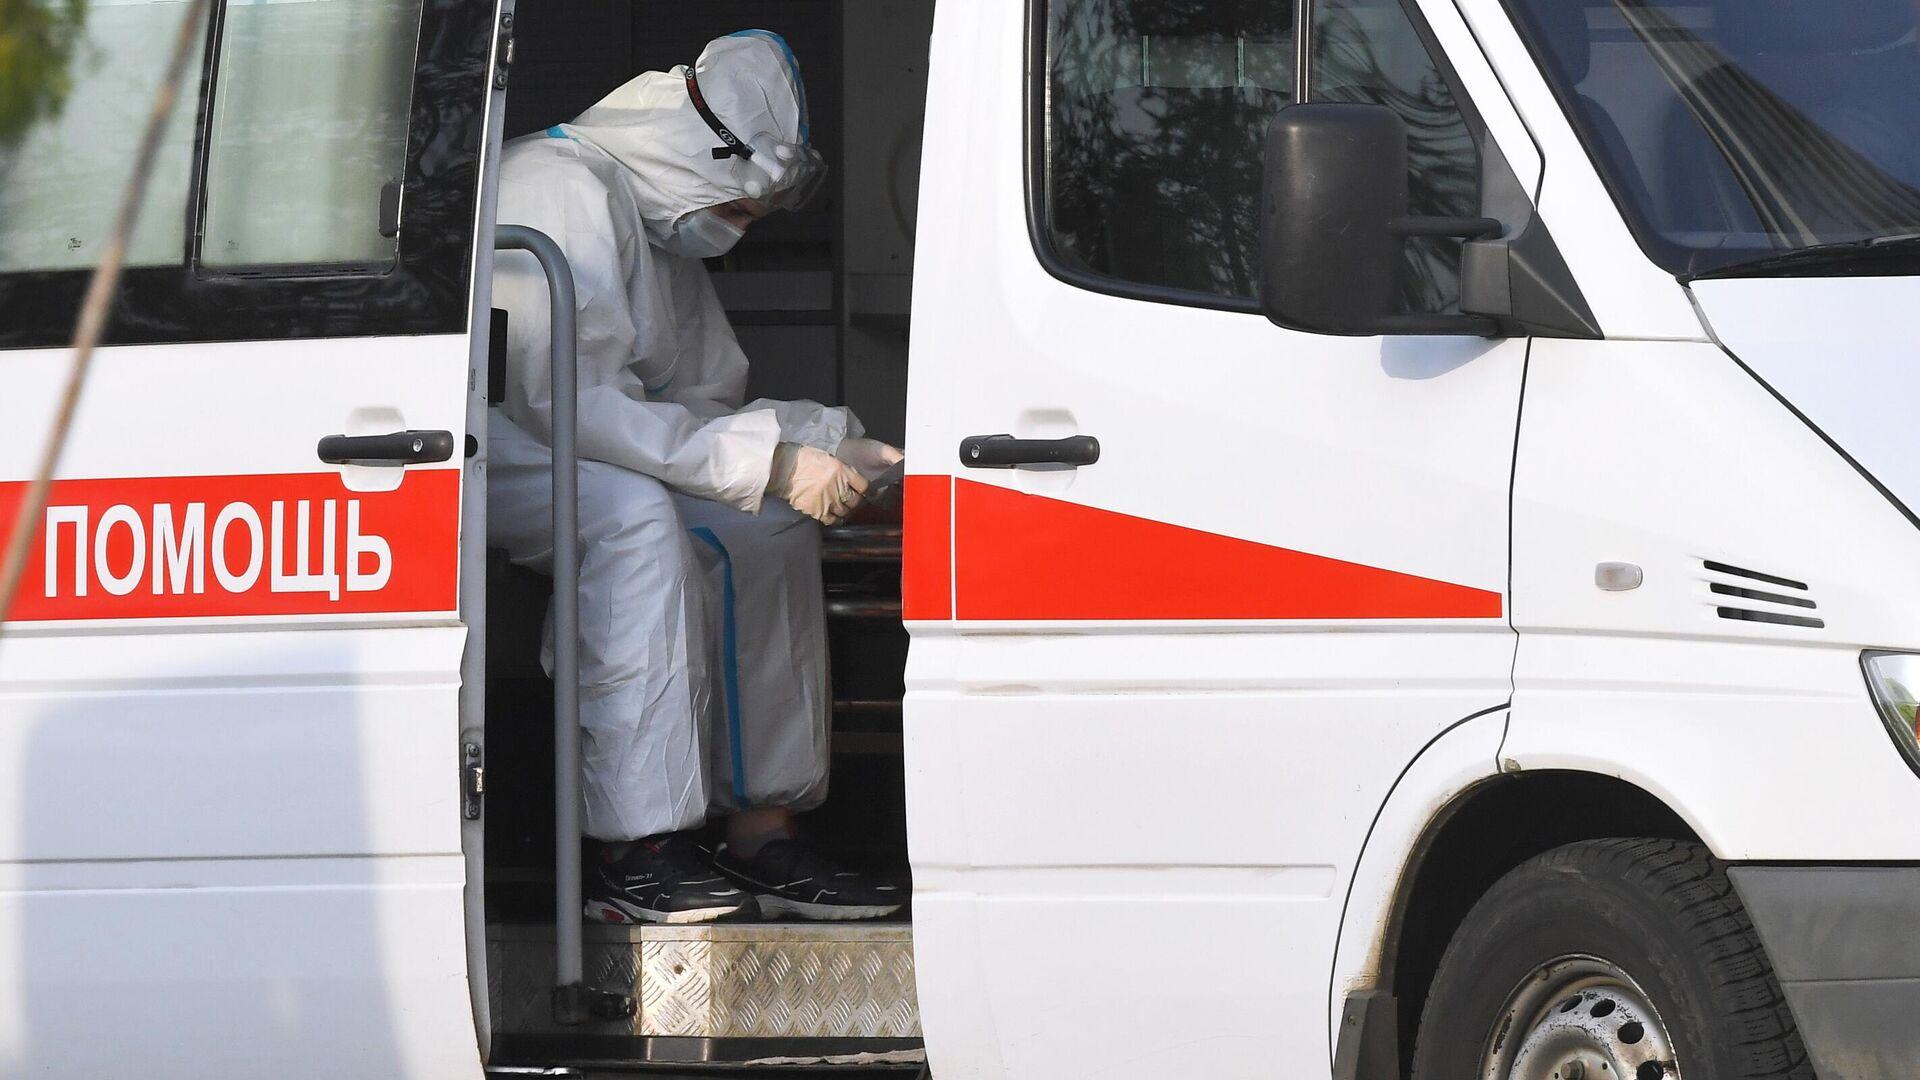 1577782503 0:0:2844:1601 1920x0 80 0 0 2d1995d1fe27e9e609858dfd408a7499 - В России за сутки выявили 9859 случаев заражения коронавирусом